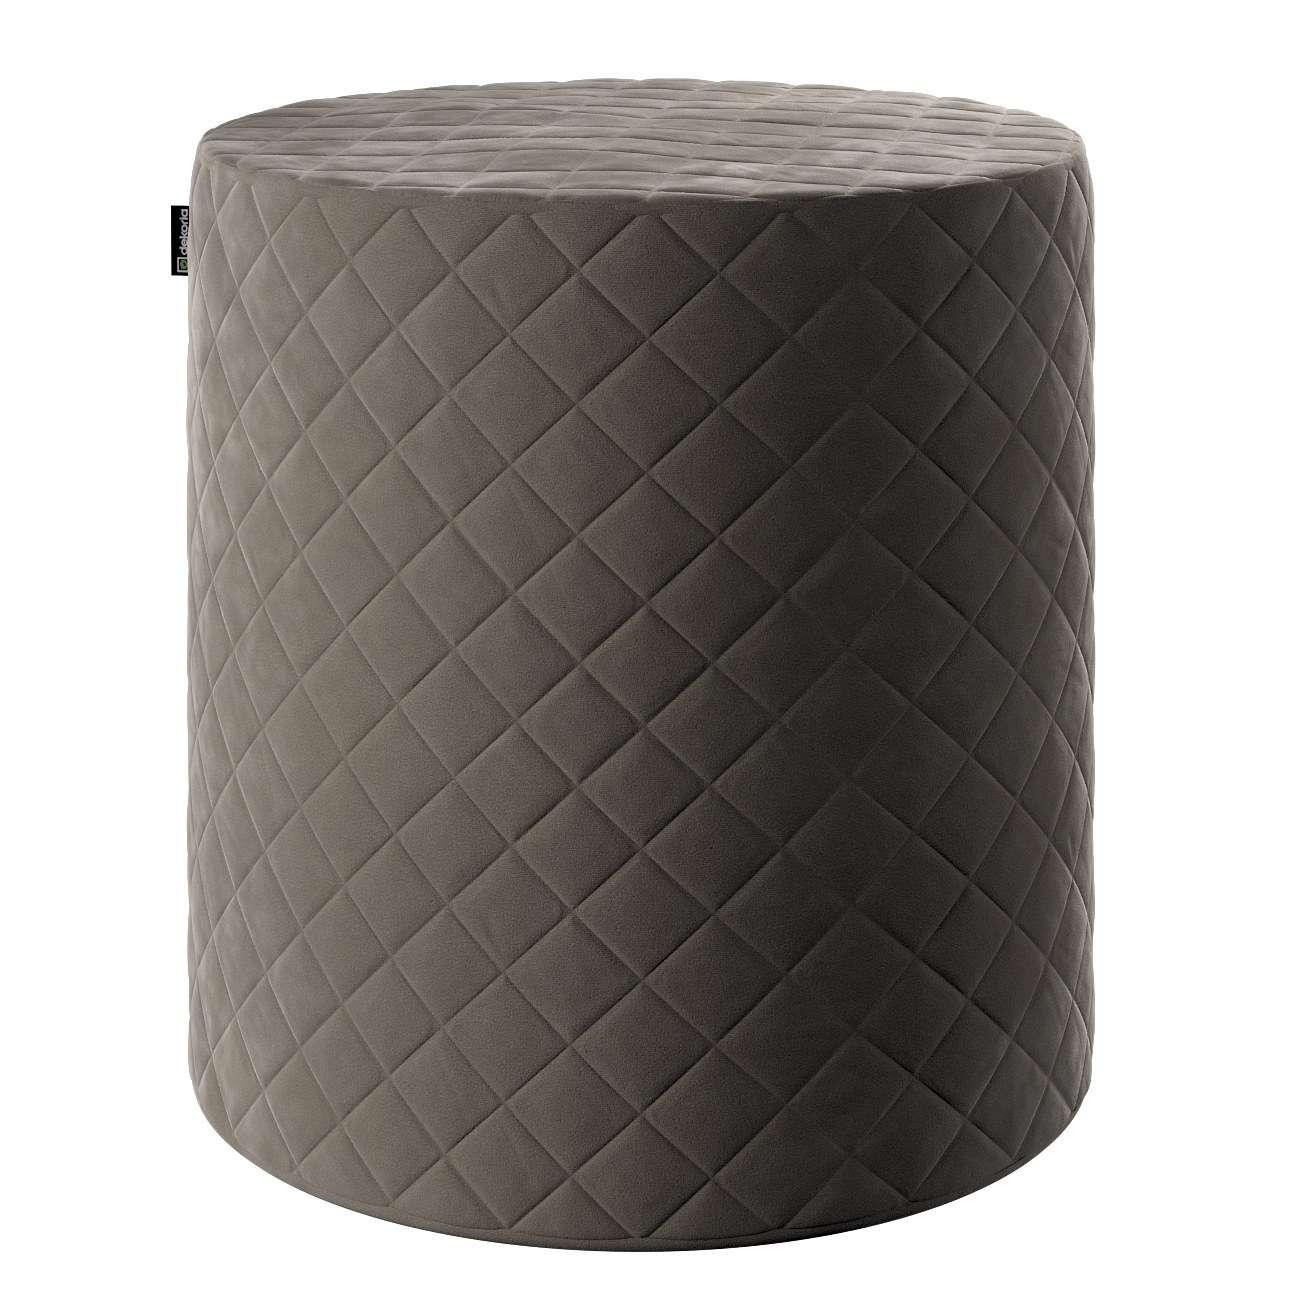 Puf Barrel pikowany w kolekcji Velvet, tkanina: 704-19